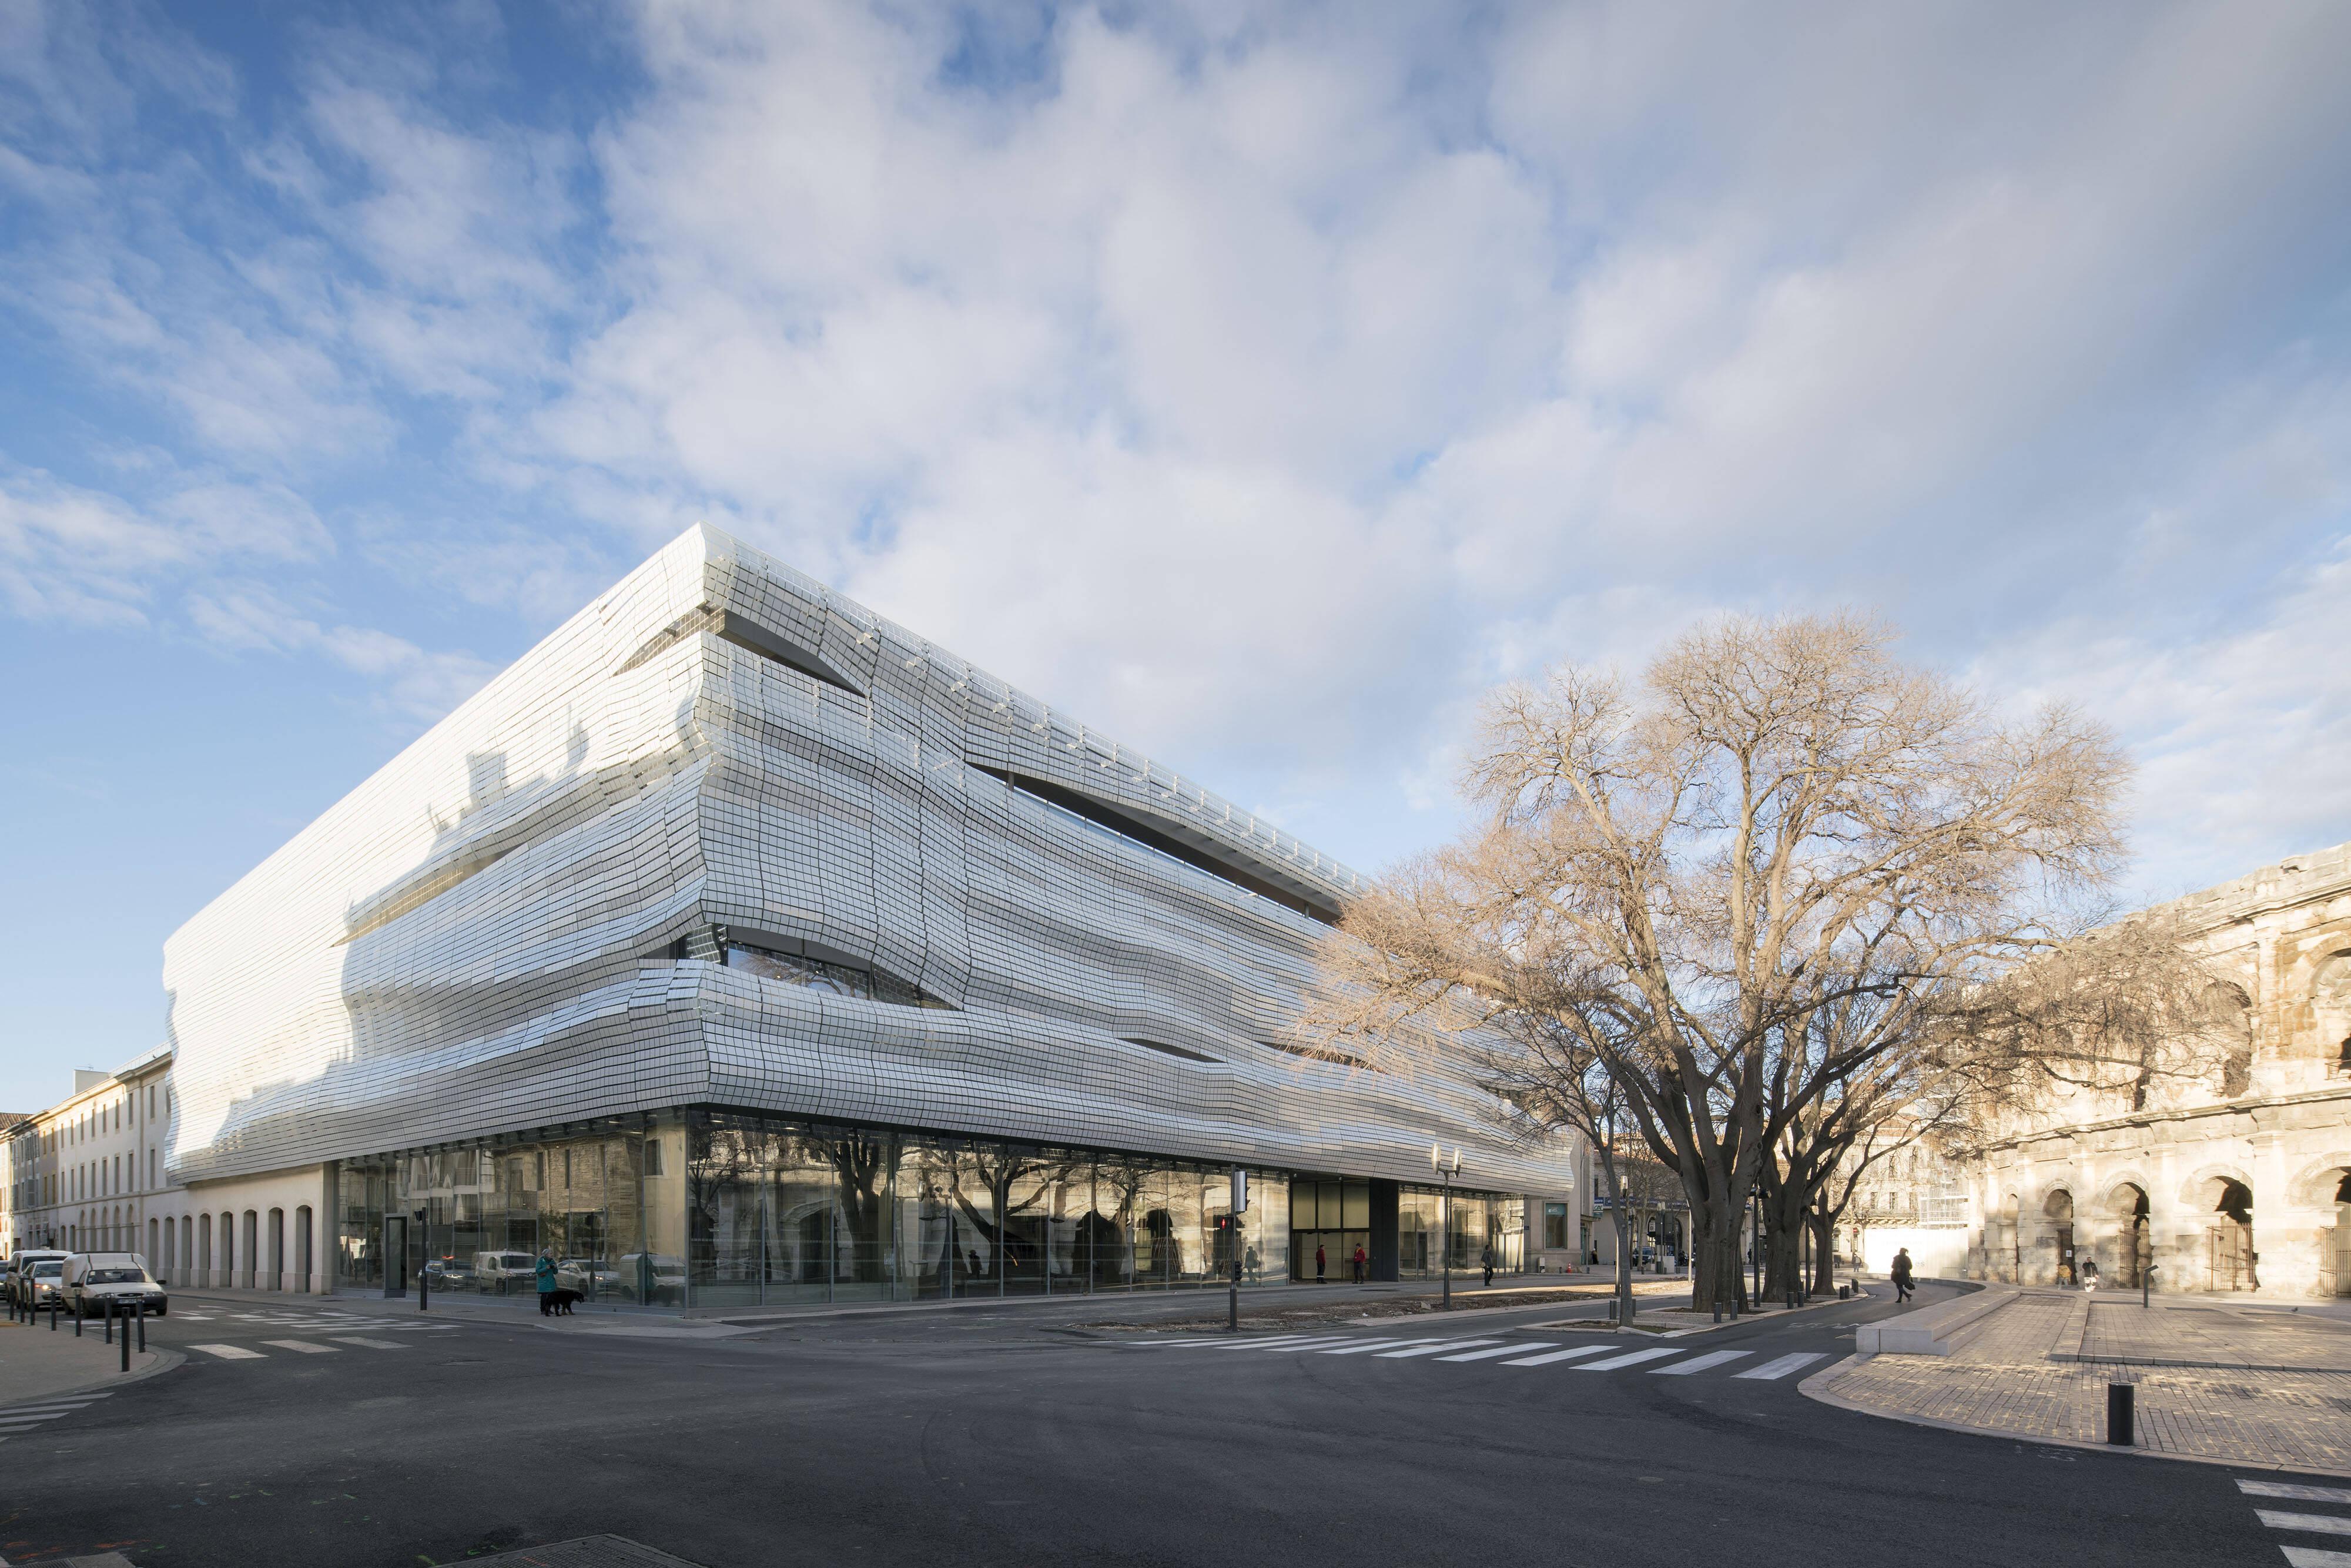 O prédio do Musée de La Romanité, todo em vidro /Foto: Nicolas Borel